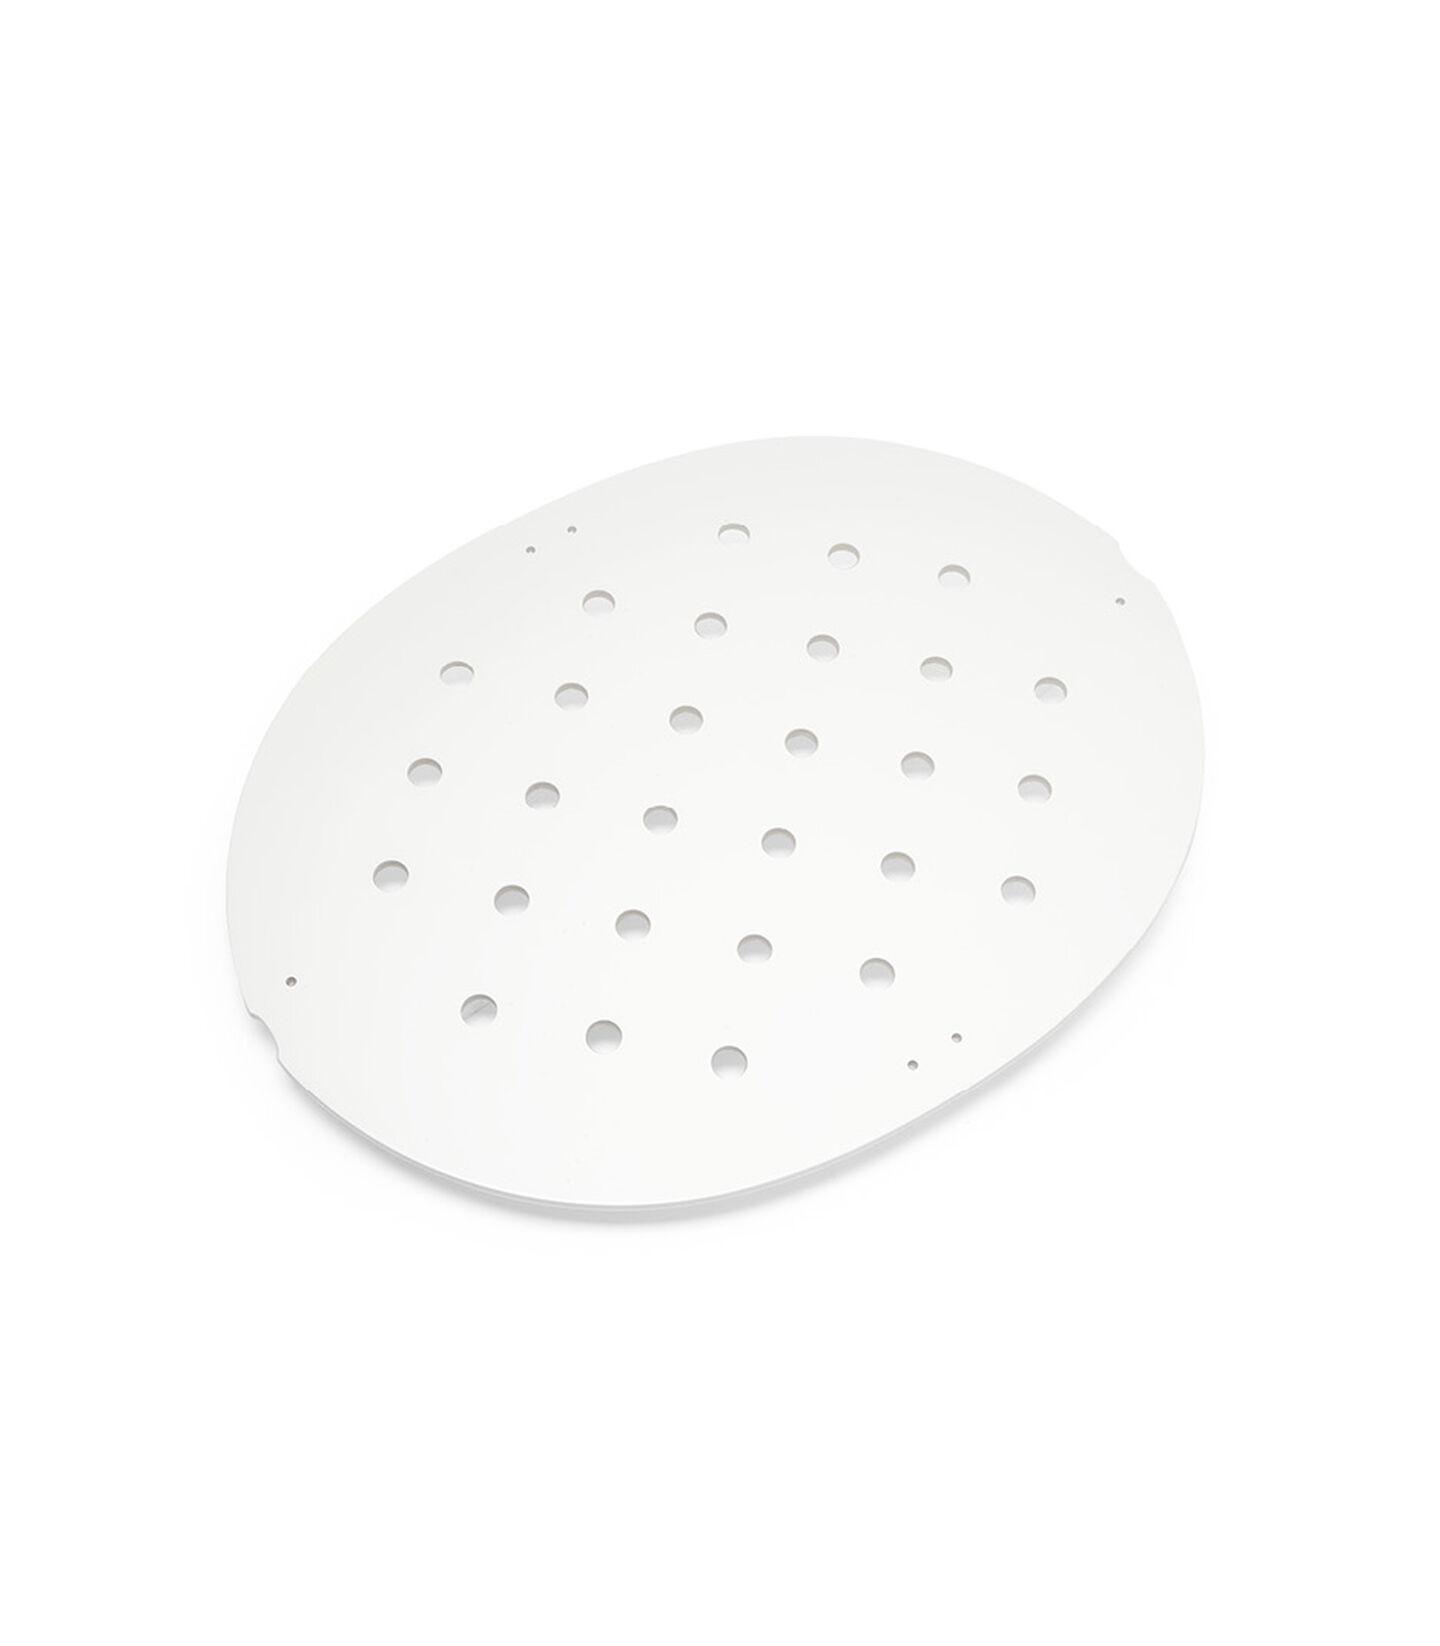 Stokke® Sleepi™ Mini Fond de lit (plywood) Blanc, Blanc, mainview view 2